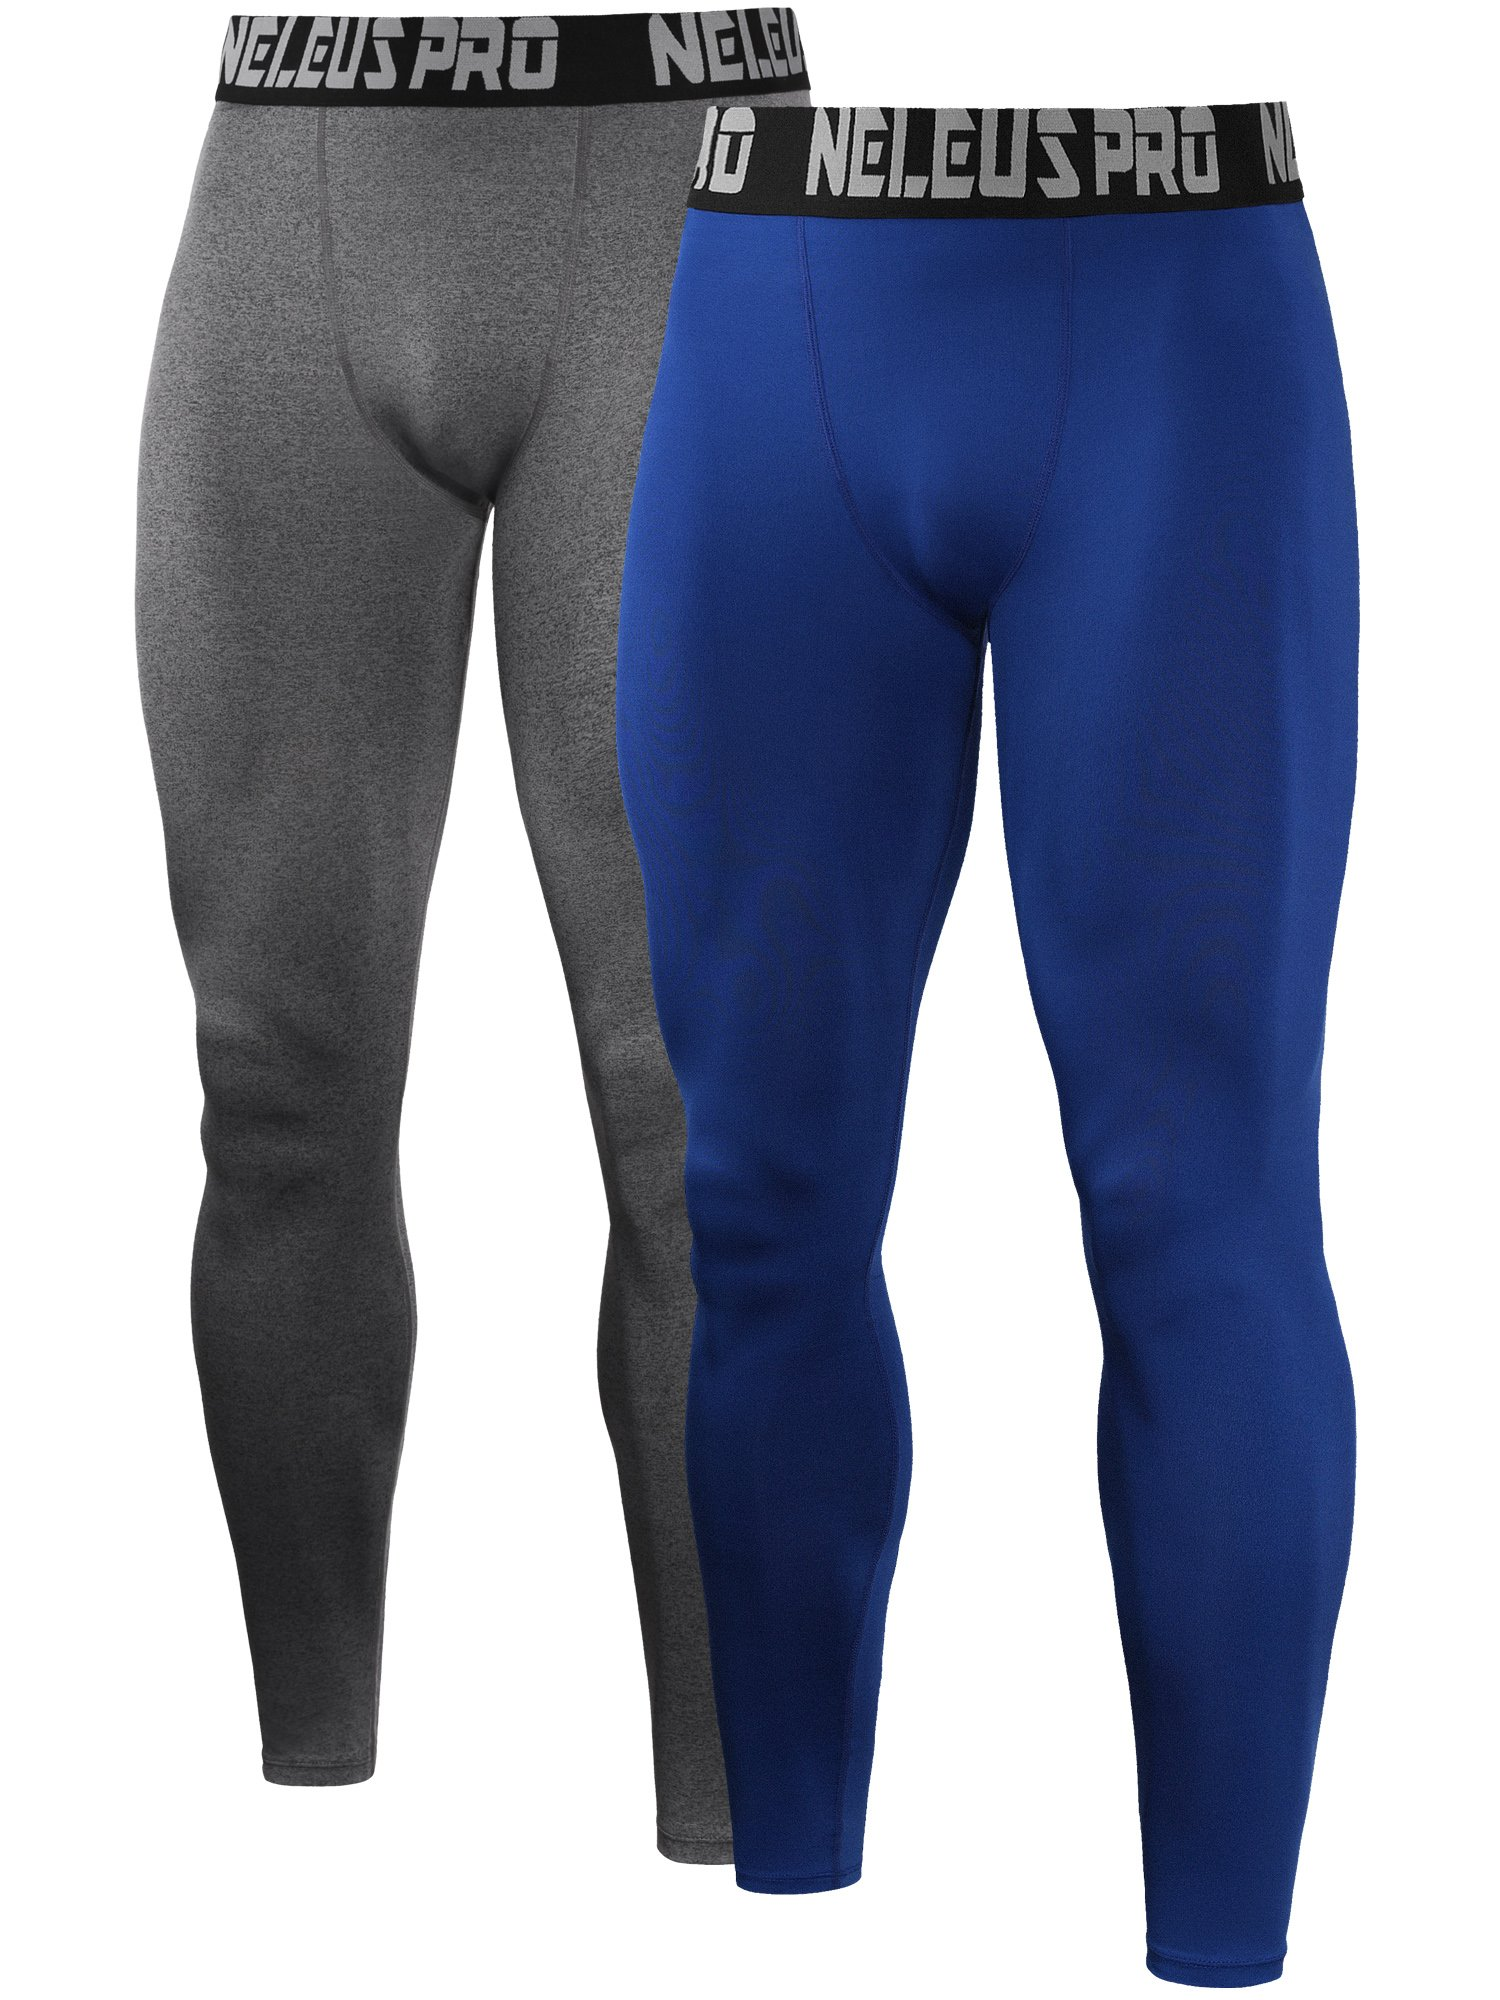 Neleus Men's 2 Pack Compression Tights Sport Running Leggings Pants,6019,Grey,Blue,US S,EU M